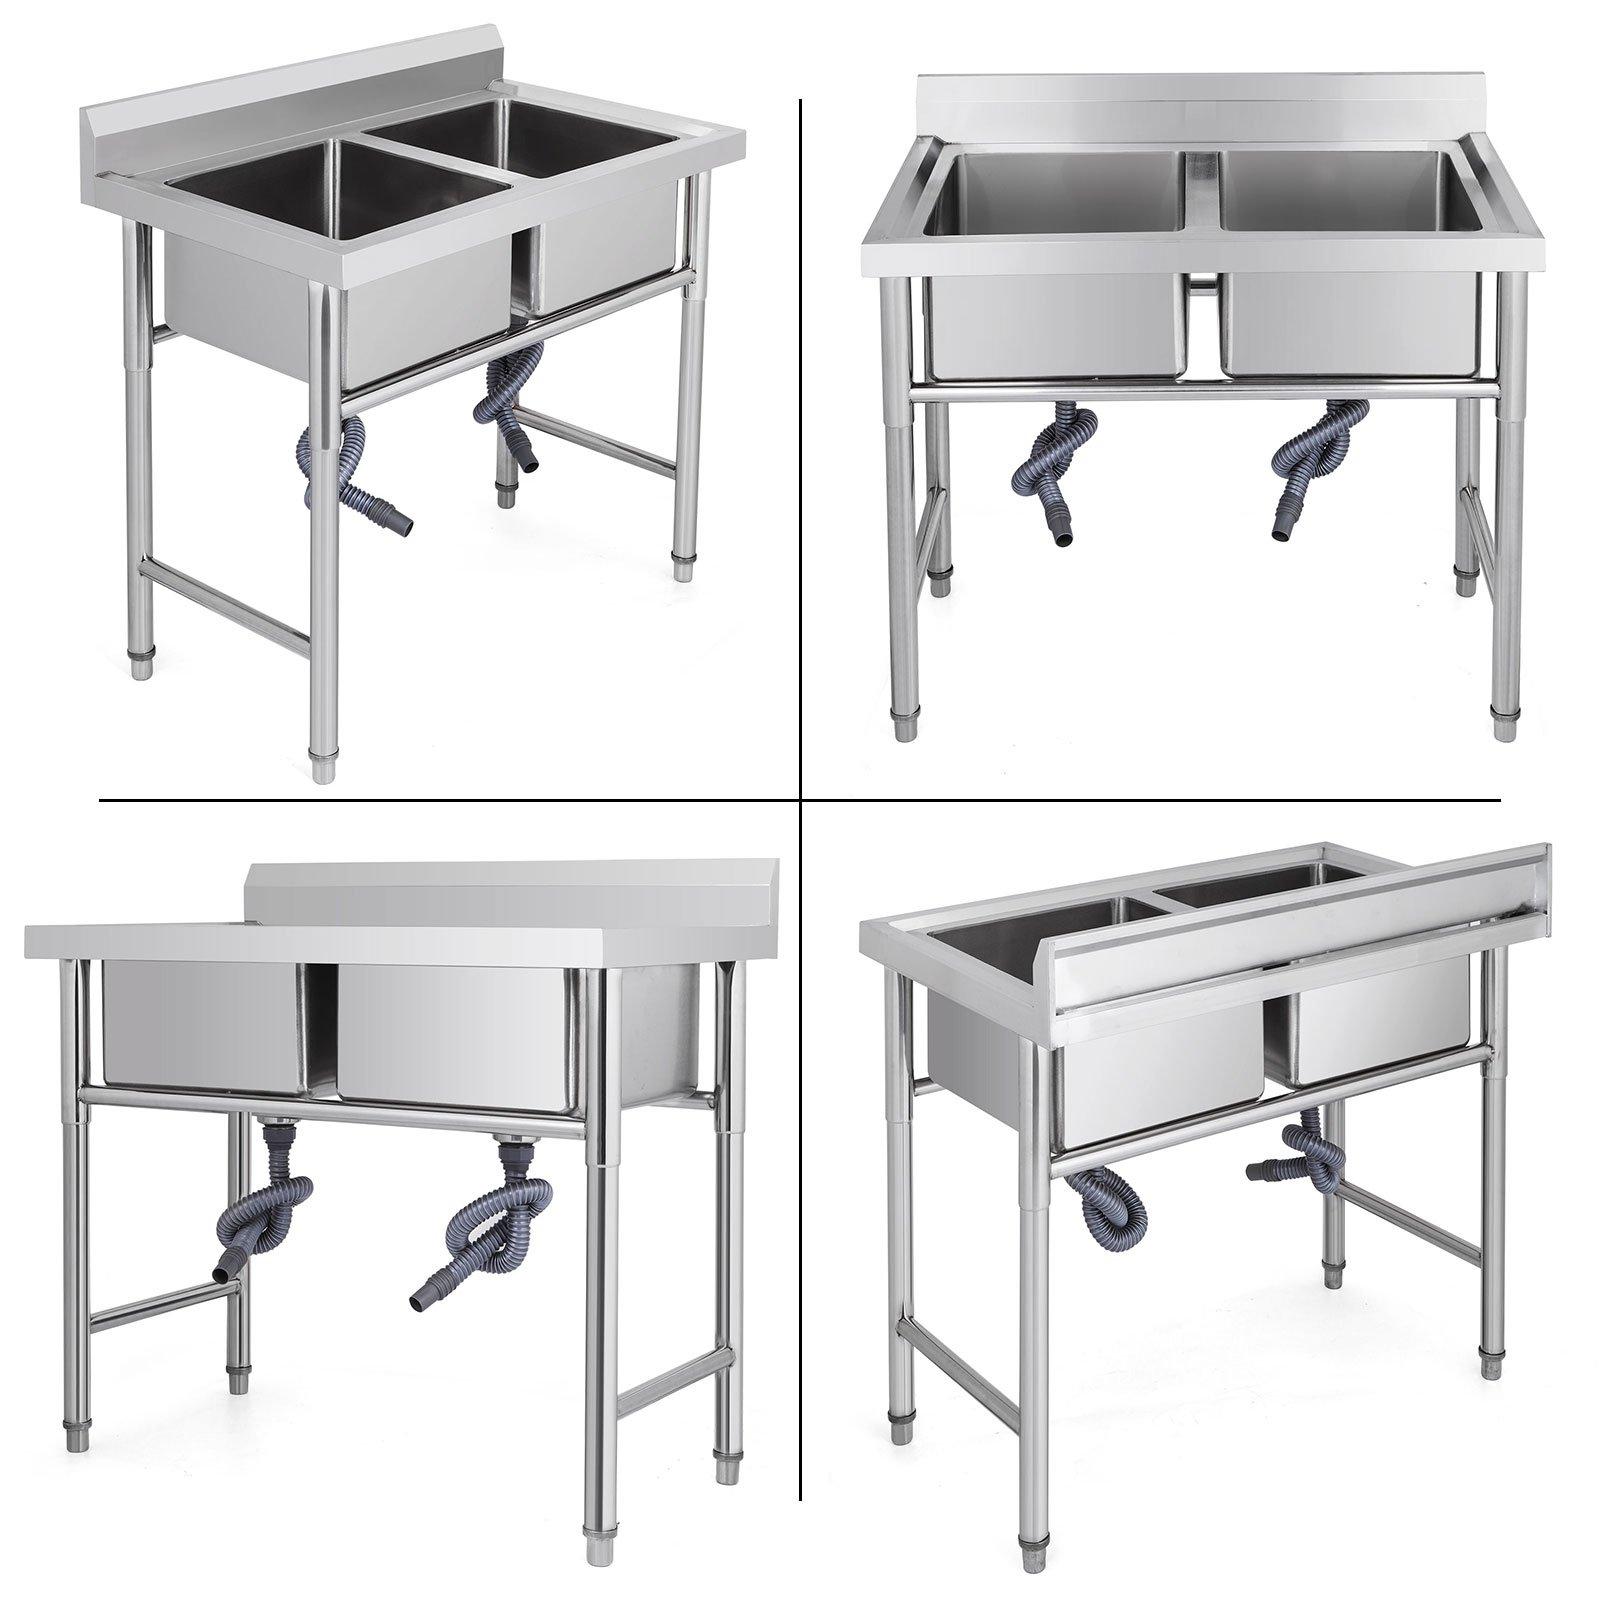 "Mophorn 2 Compartment Stainless Steel Bar Sink 15.5"" x 16.5""Bowl Size Handmade Underbar Sink for bar, kitchen restaurant by Mophorn (Image #9)"